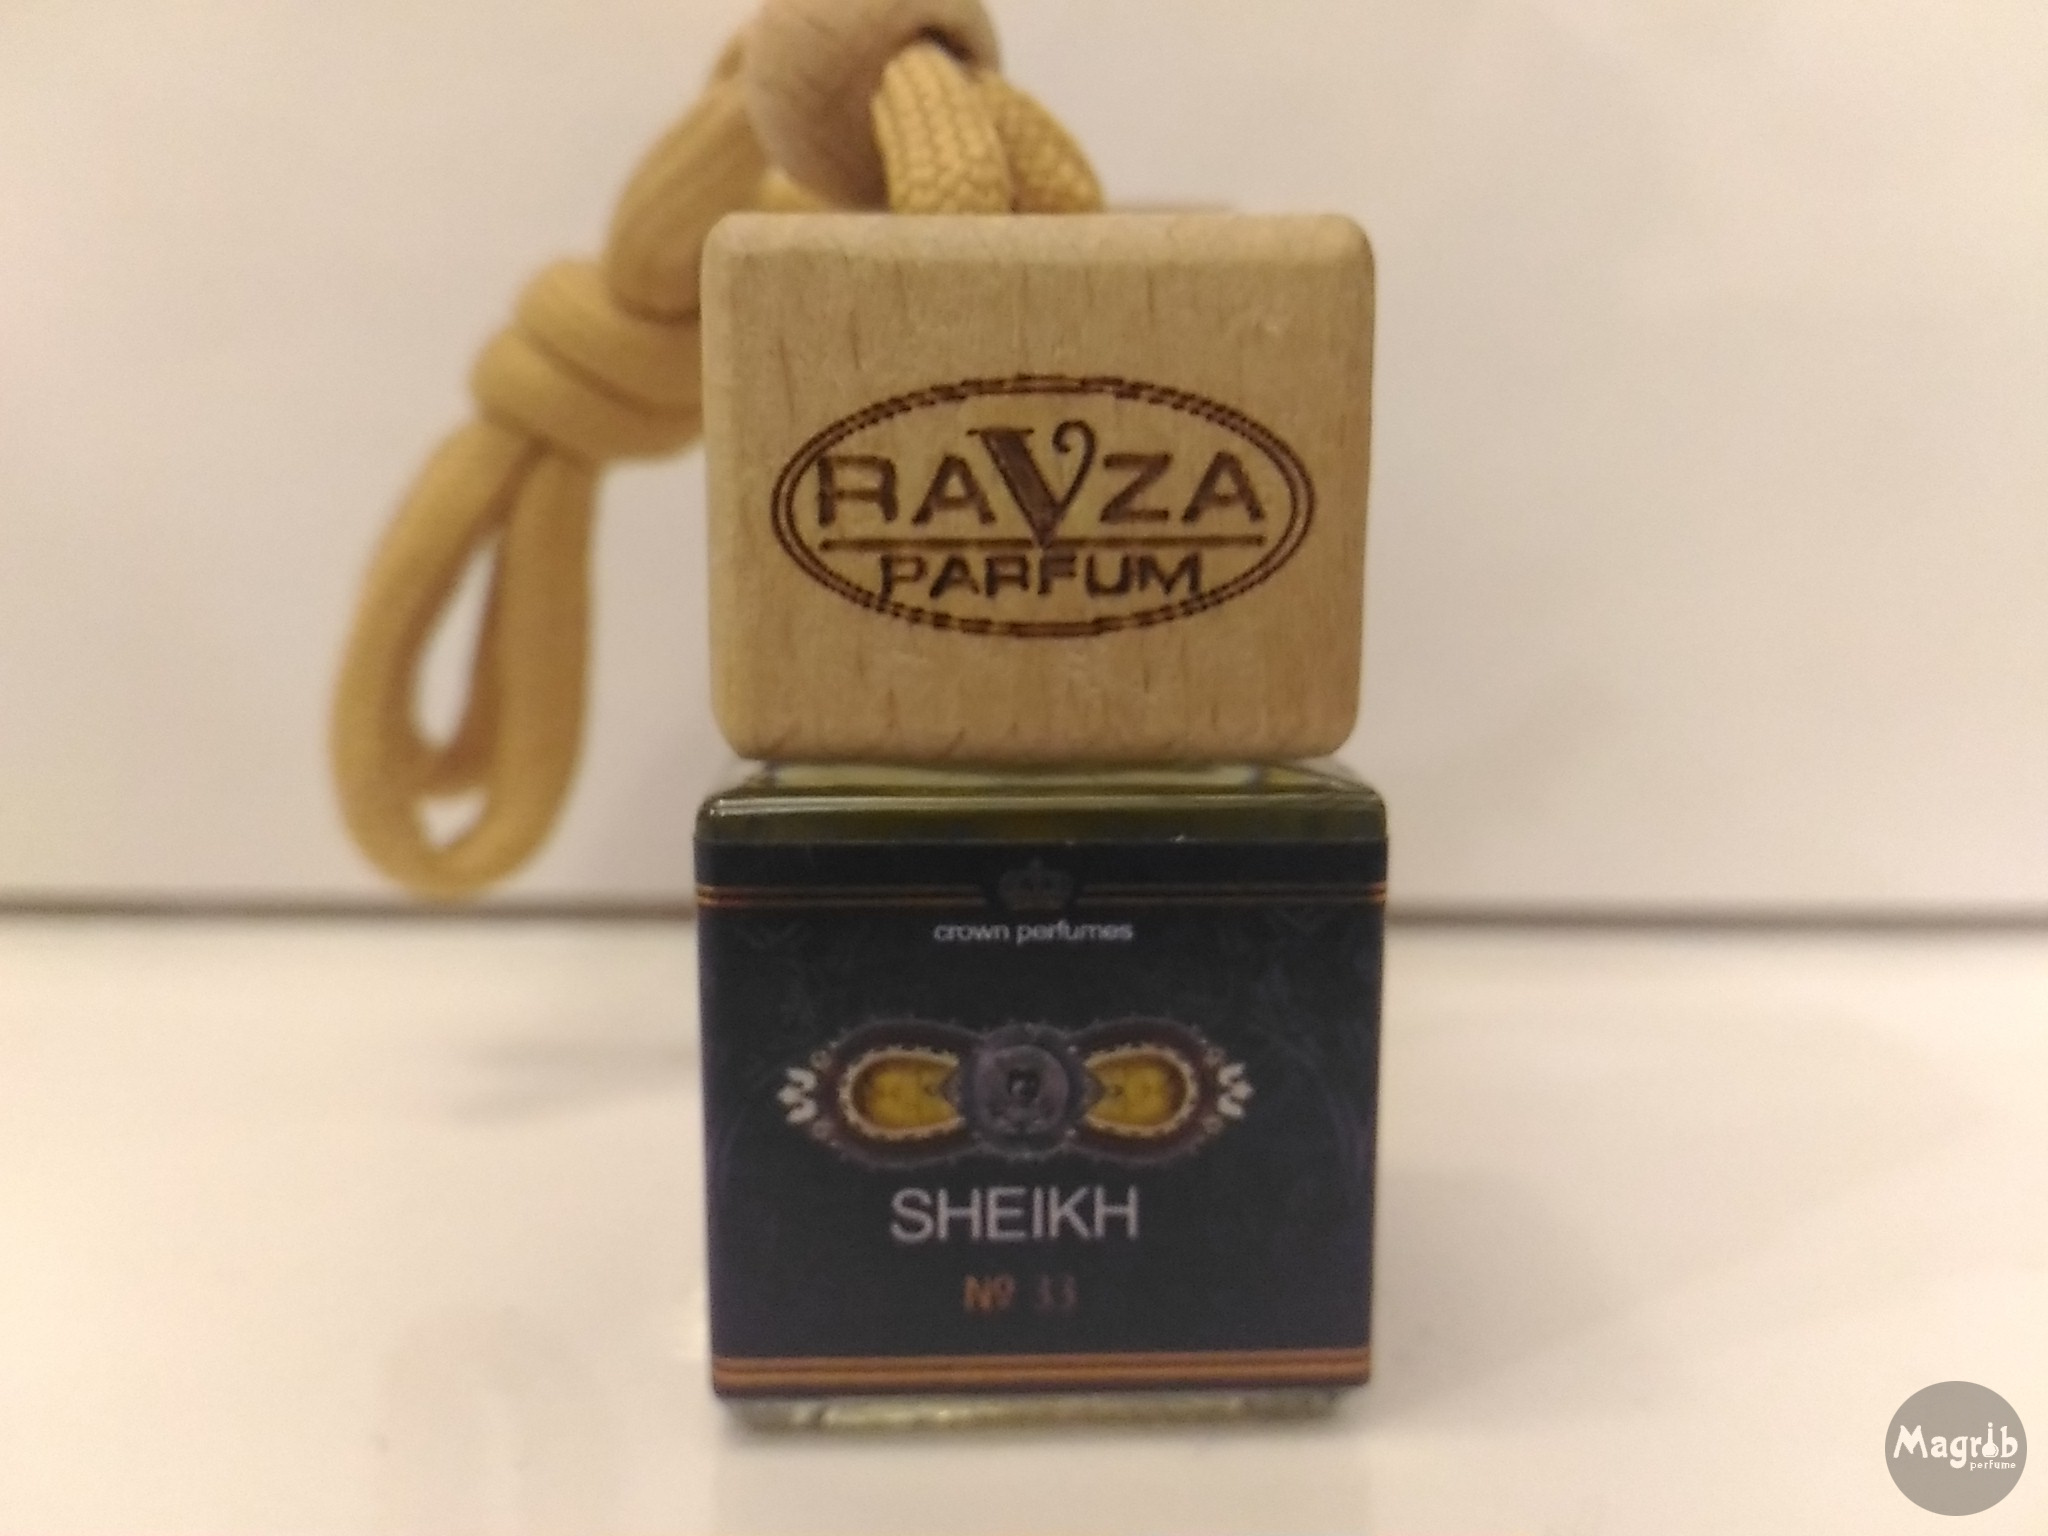 Ravza Sheikh 33 8мл - автопарфюм